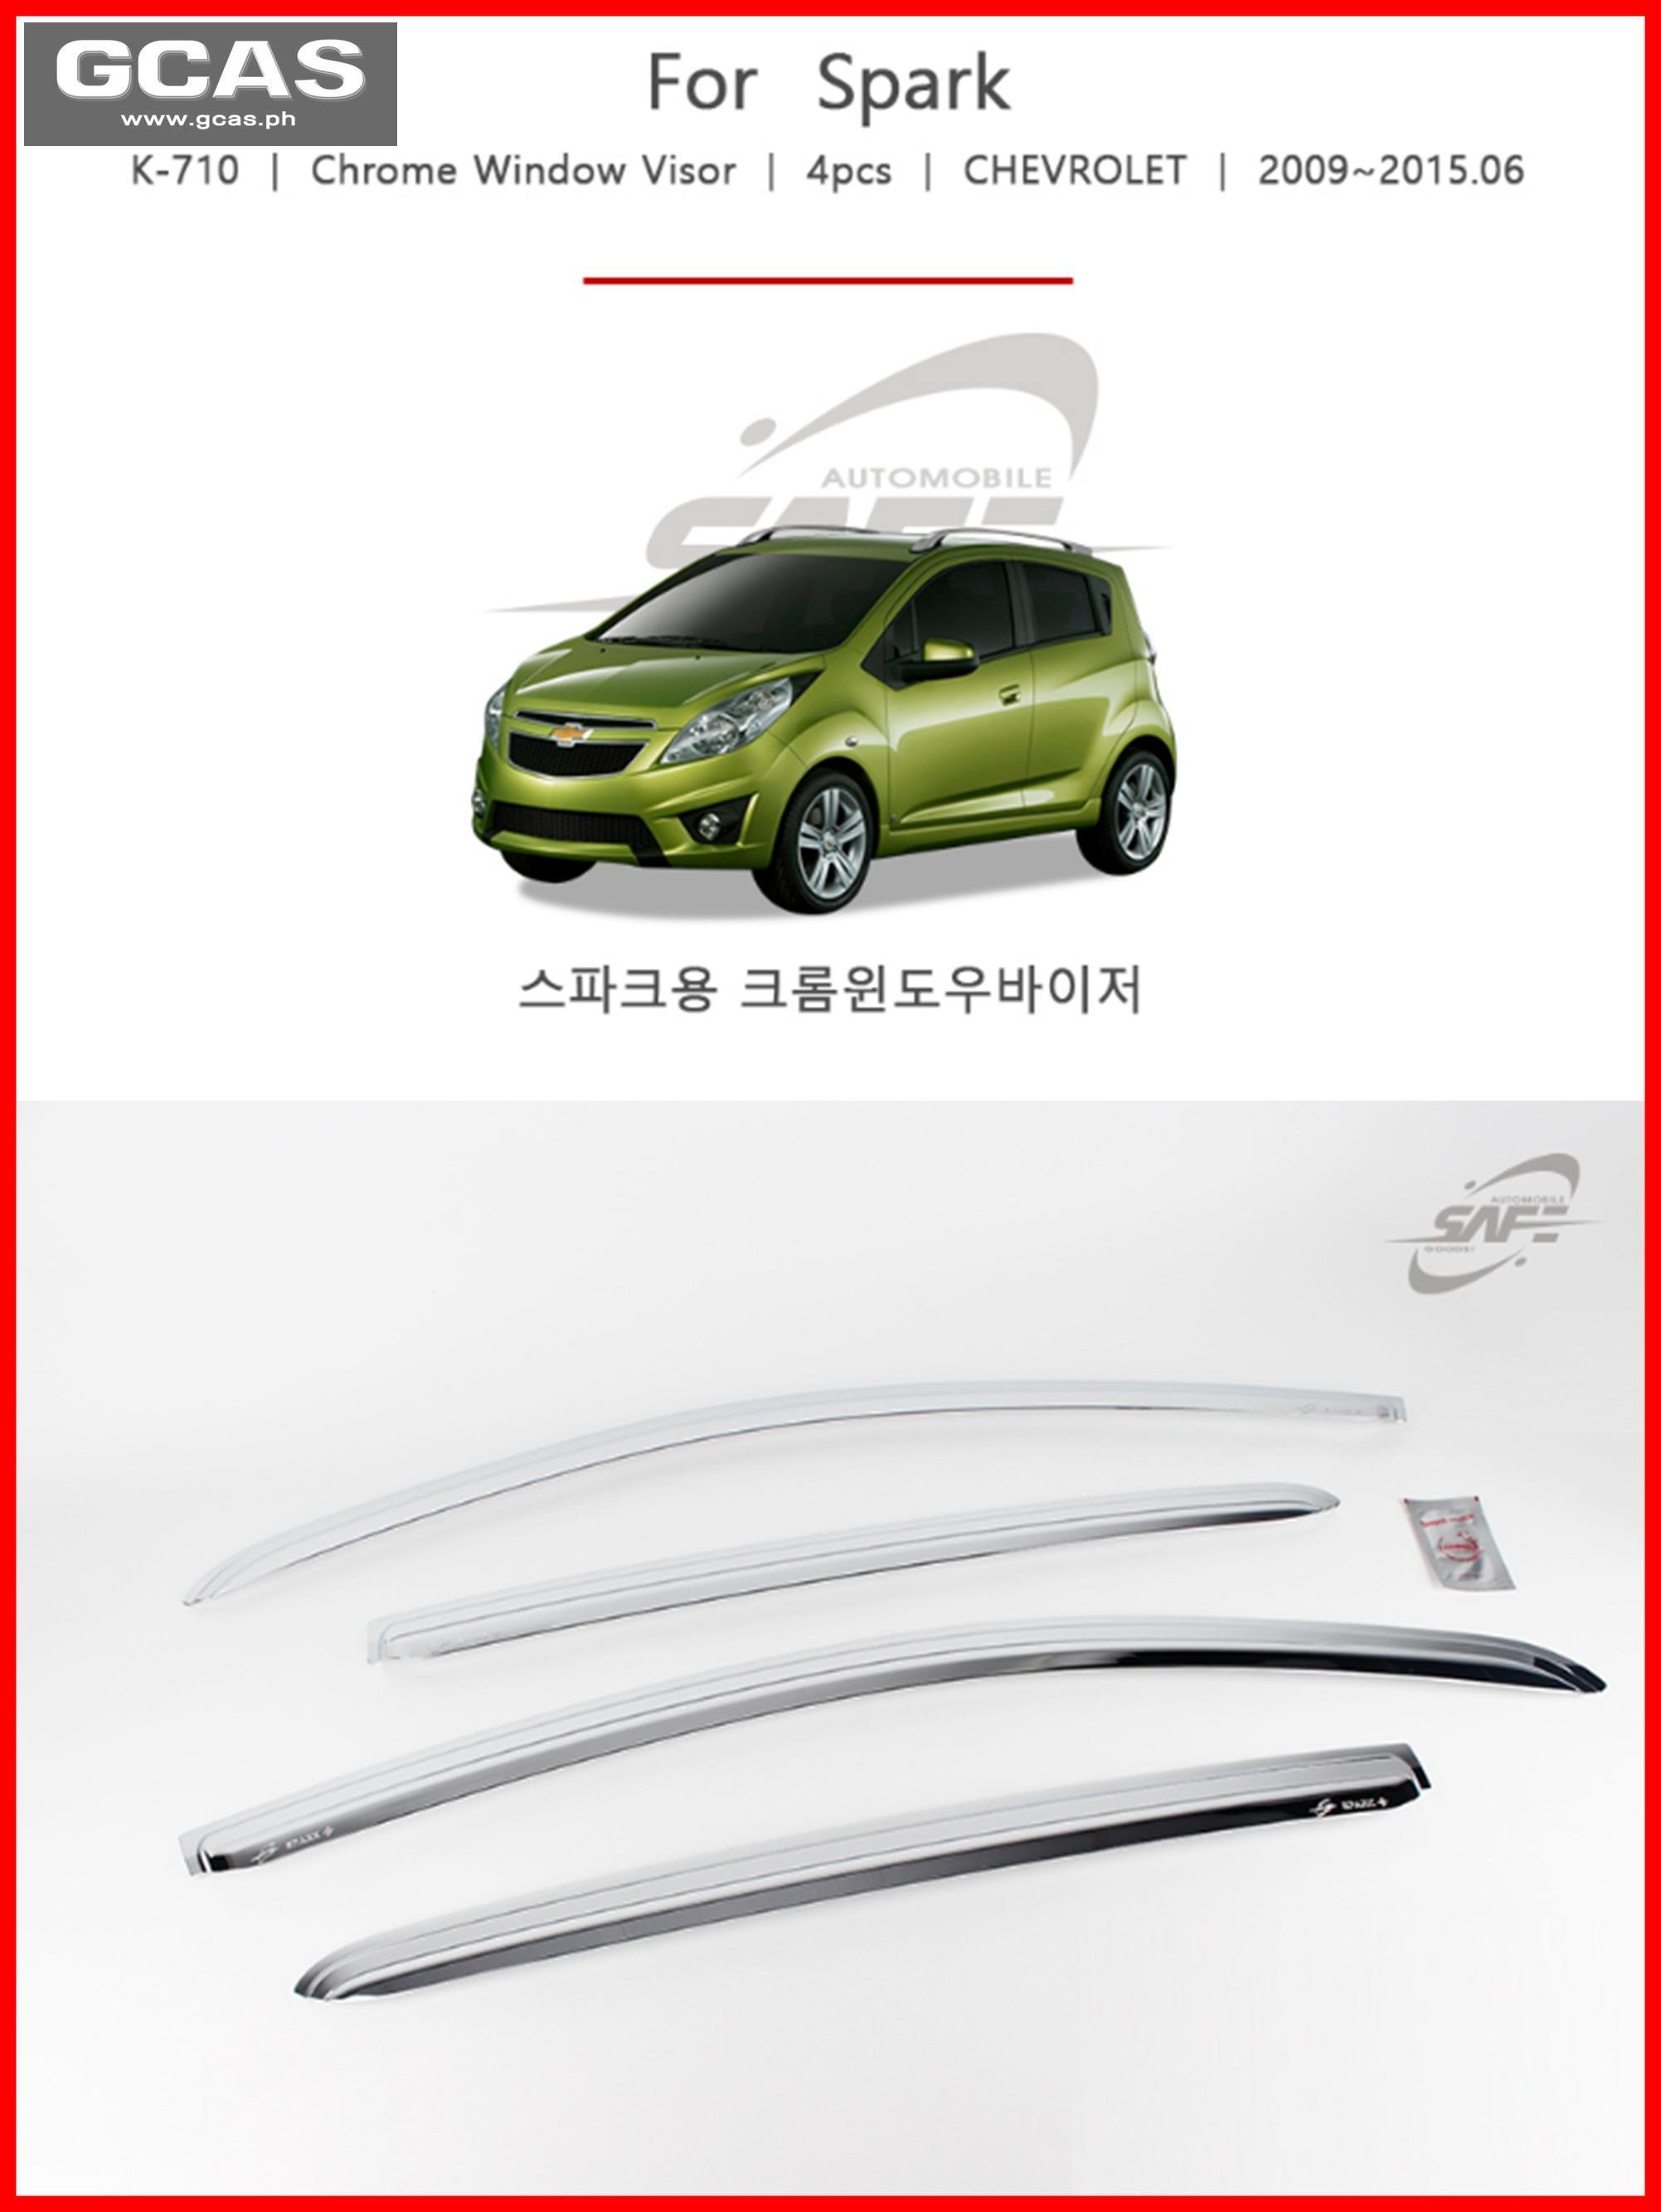 Lip//6 Uneven Nth RoadPro RPFHC6N 8.5-Inch Chrome Front Cap//1-Inch